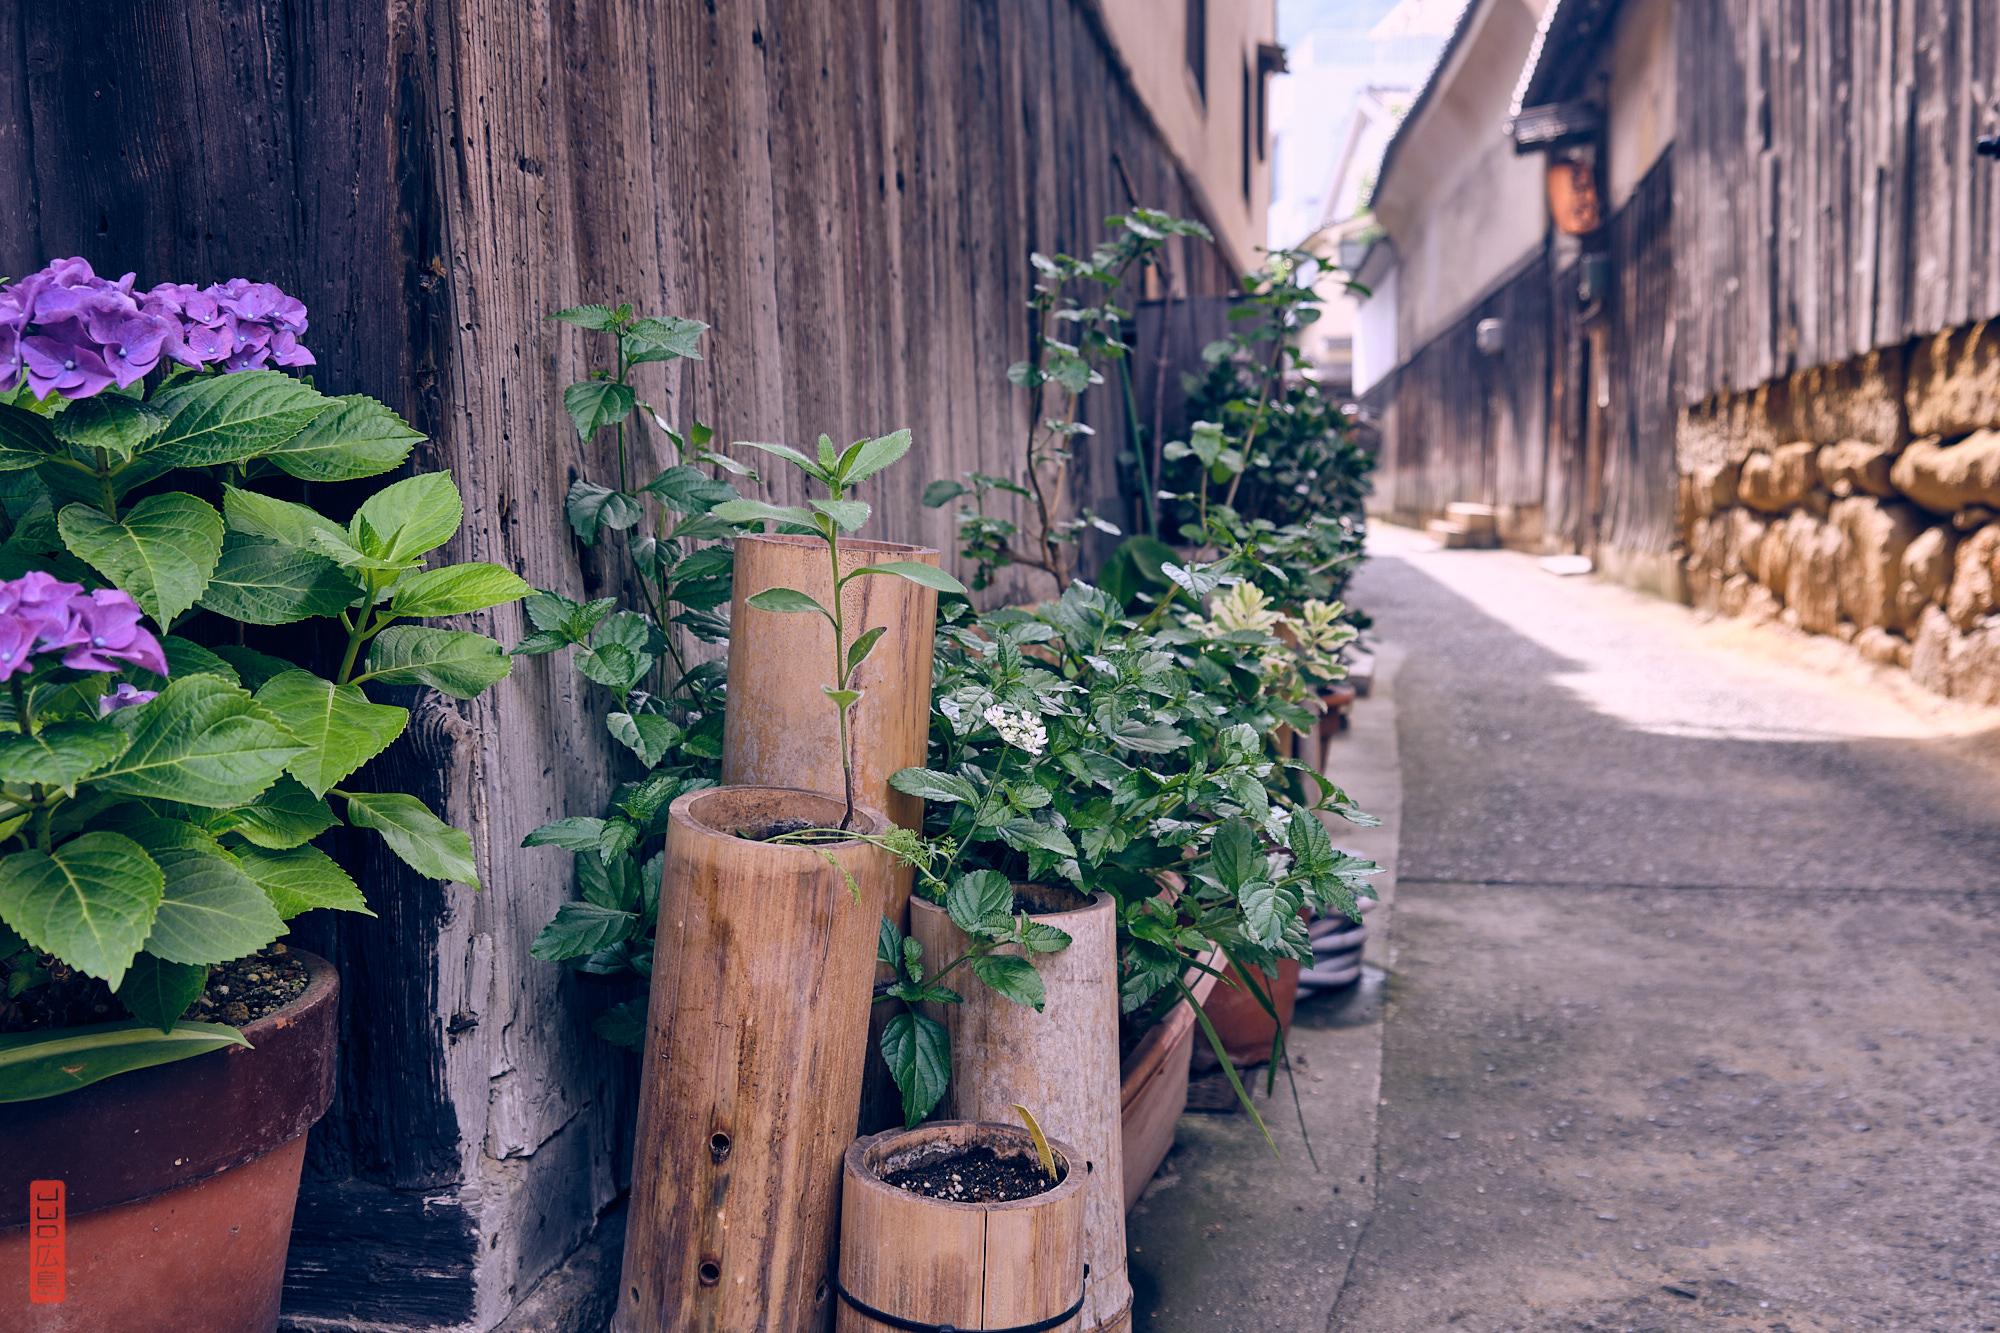 Les fleurs et les plantes dans les ruelles de Tomo-no-Ura